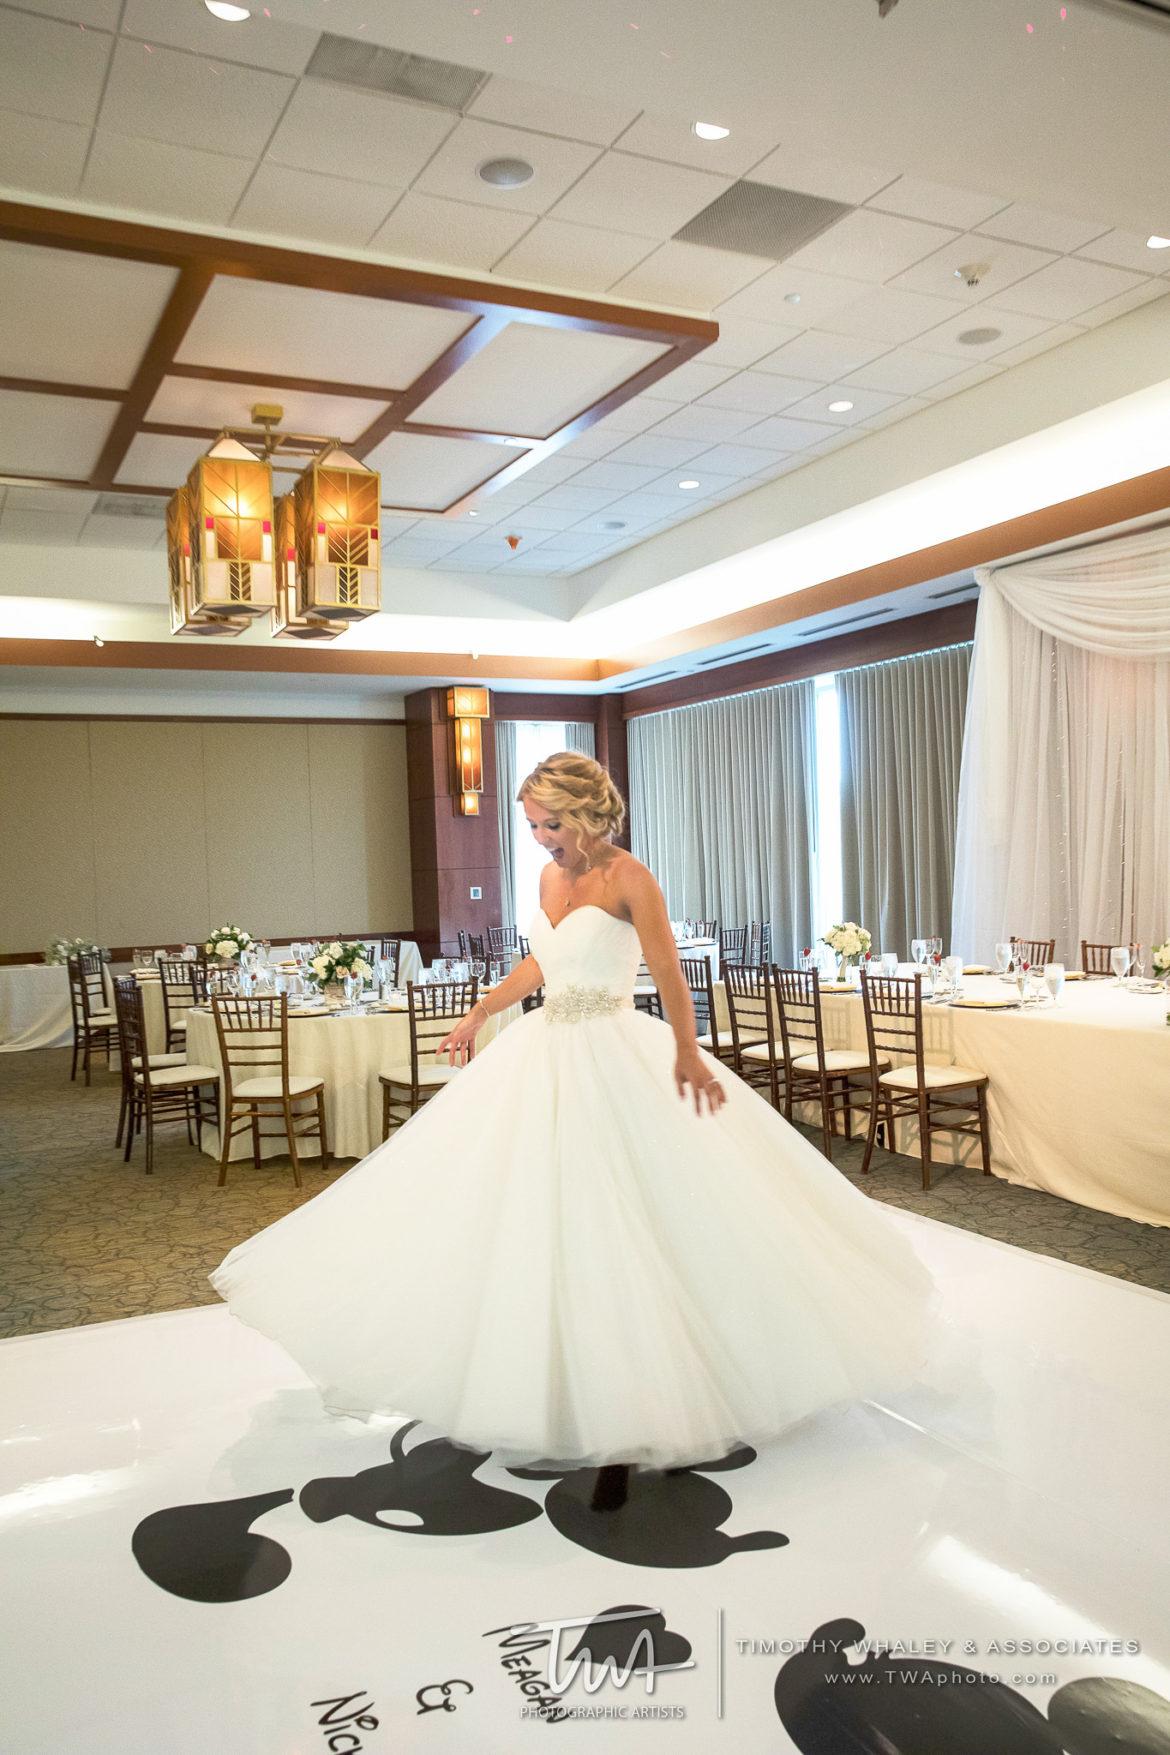 Elegant_Event_Lighting_Chicago_Eaglewood_Resort_Spa_Itasca_Wedding_Disney_Monogram_White_Vinyl_Dance_Floor